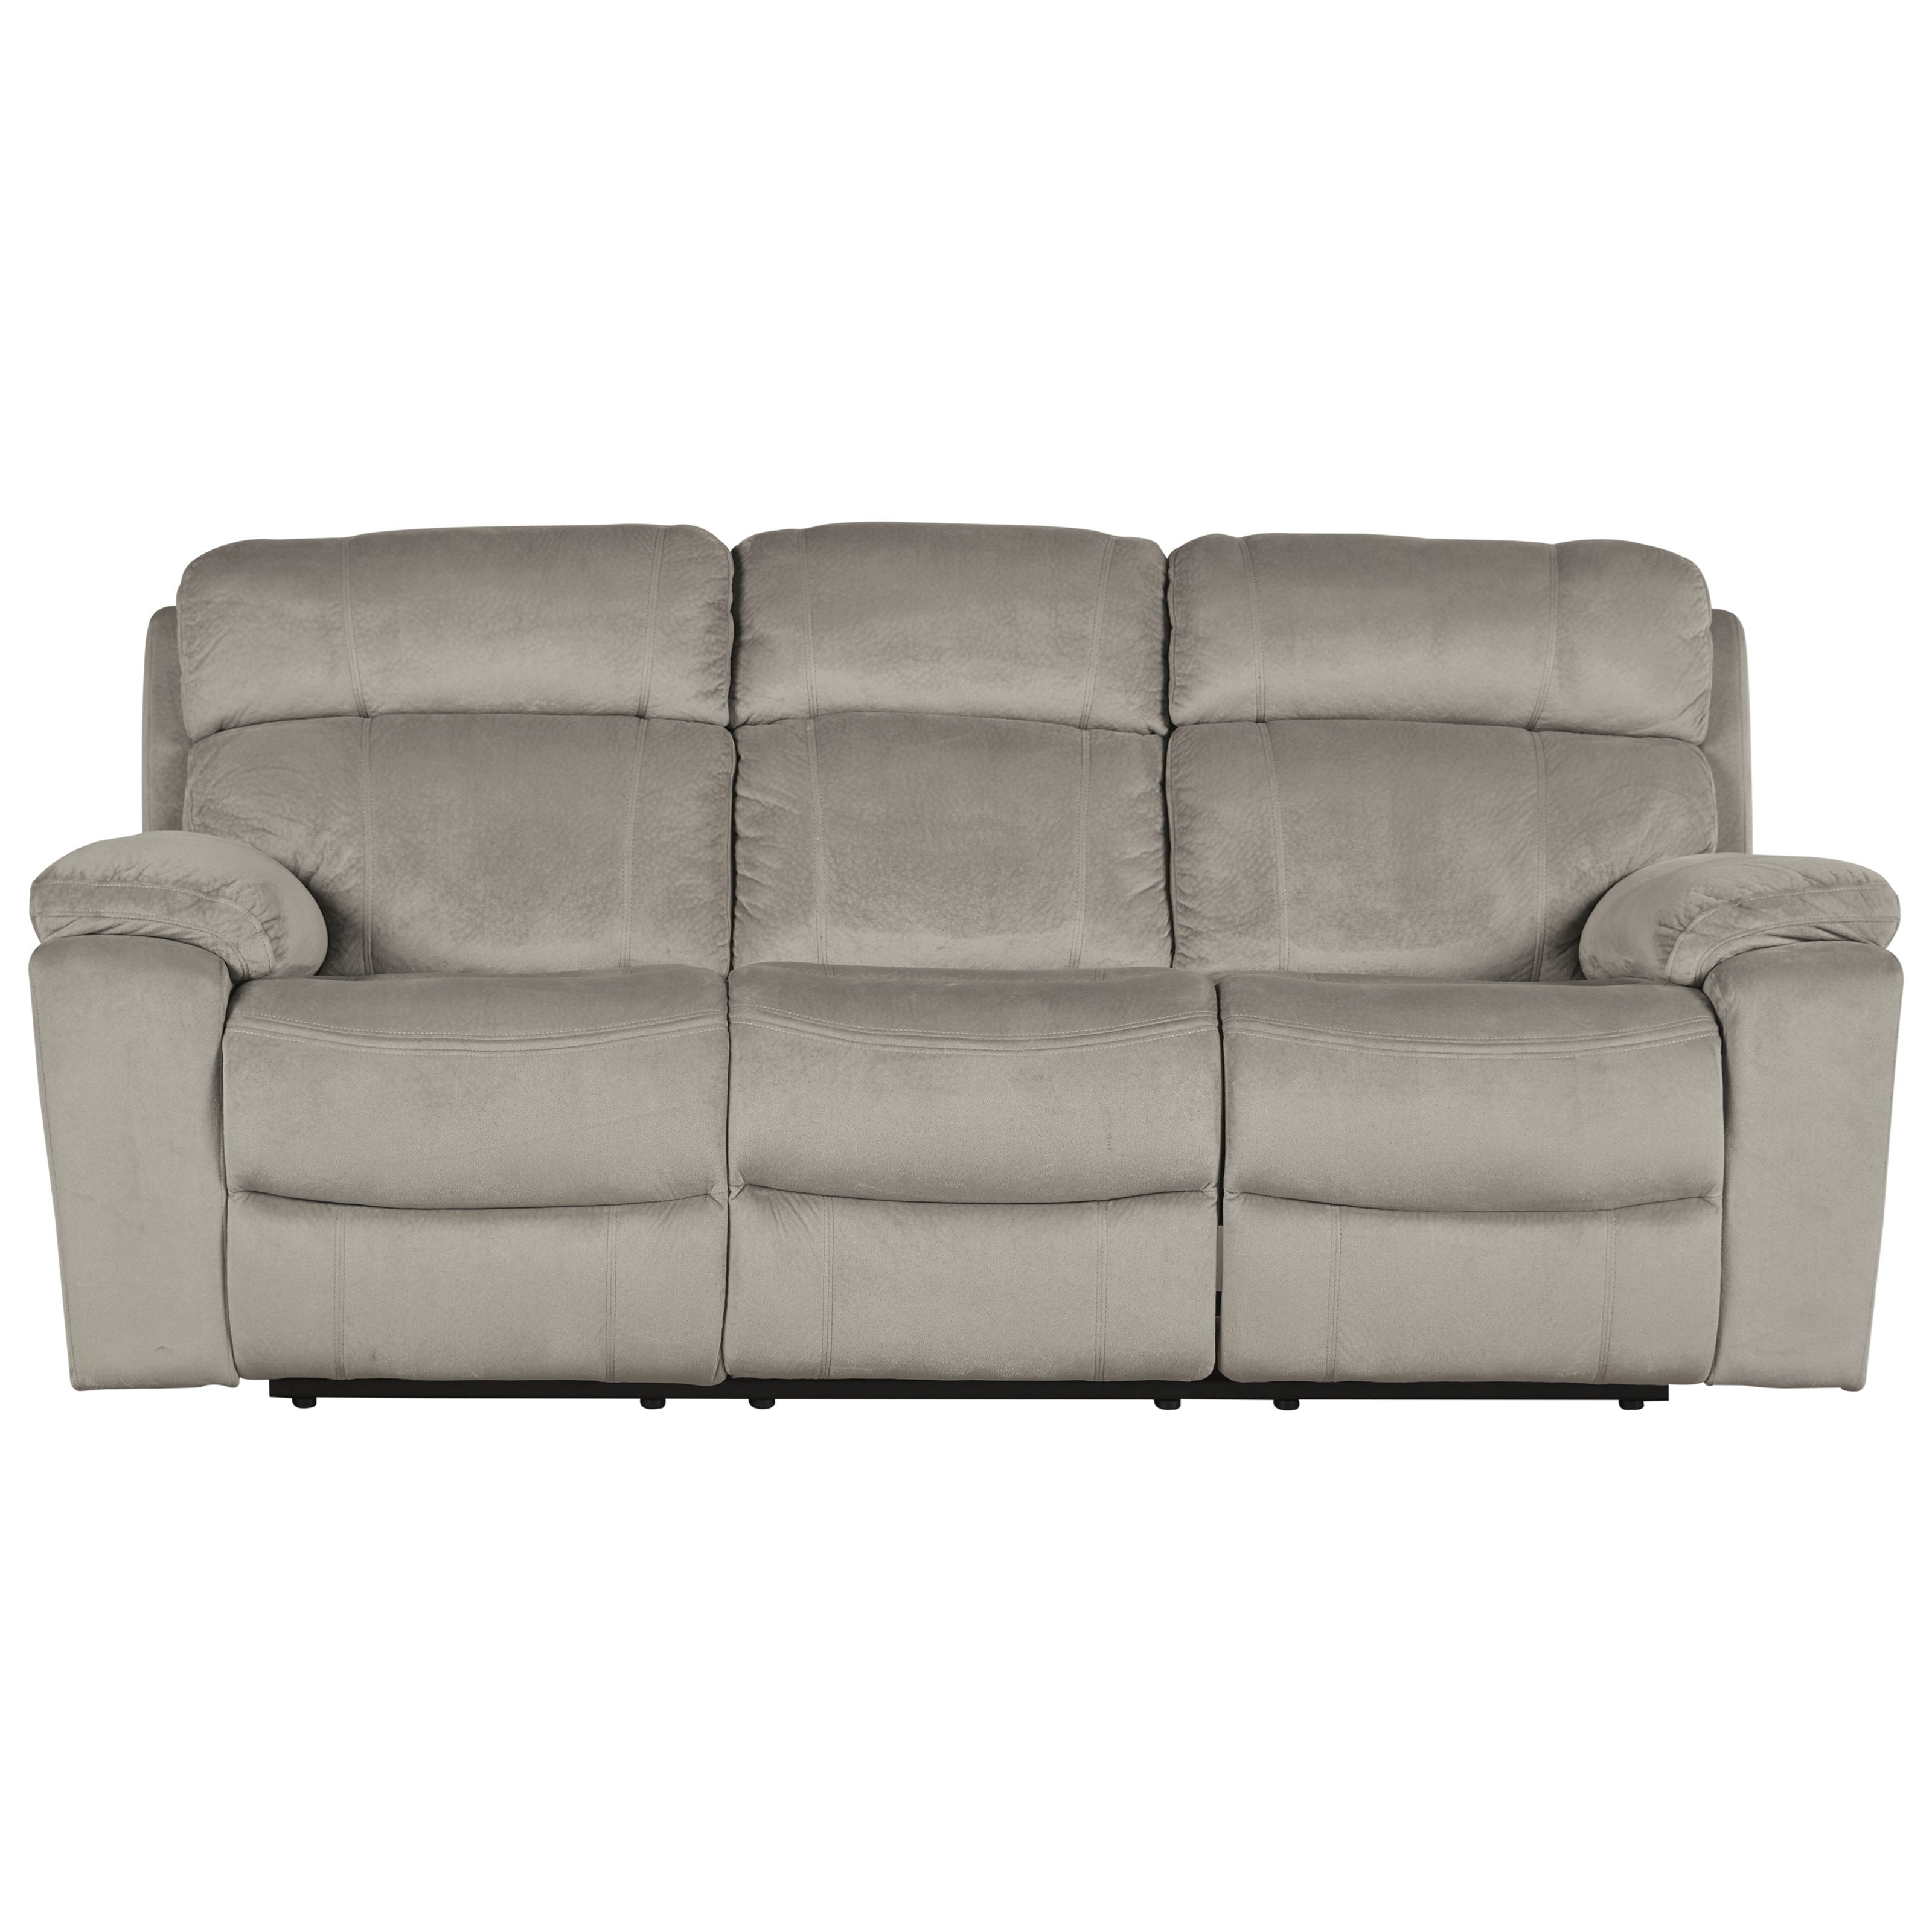 Contemporary power reclining sofa w adjustable headrest for Contemporary reclining sofas